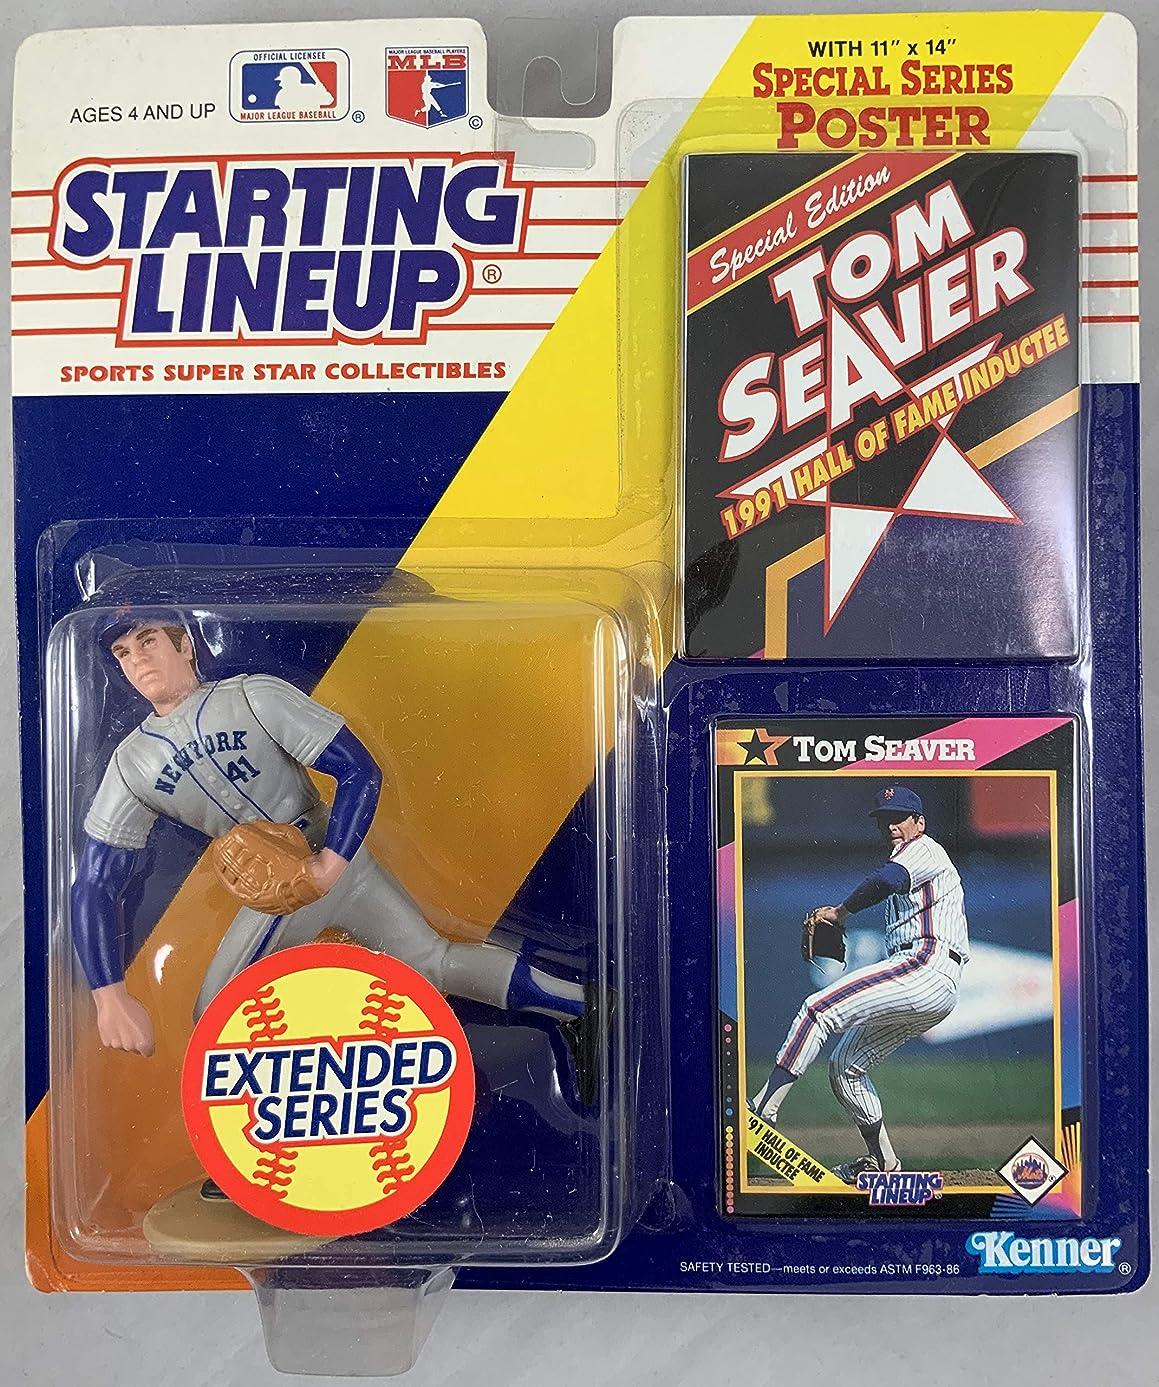 1992 KENNER STARTING LINEUP MLB EXTENDED SERIES TOM SEAVER NEW YORK METS MOC